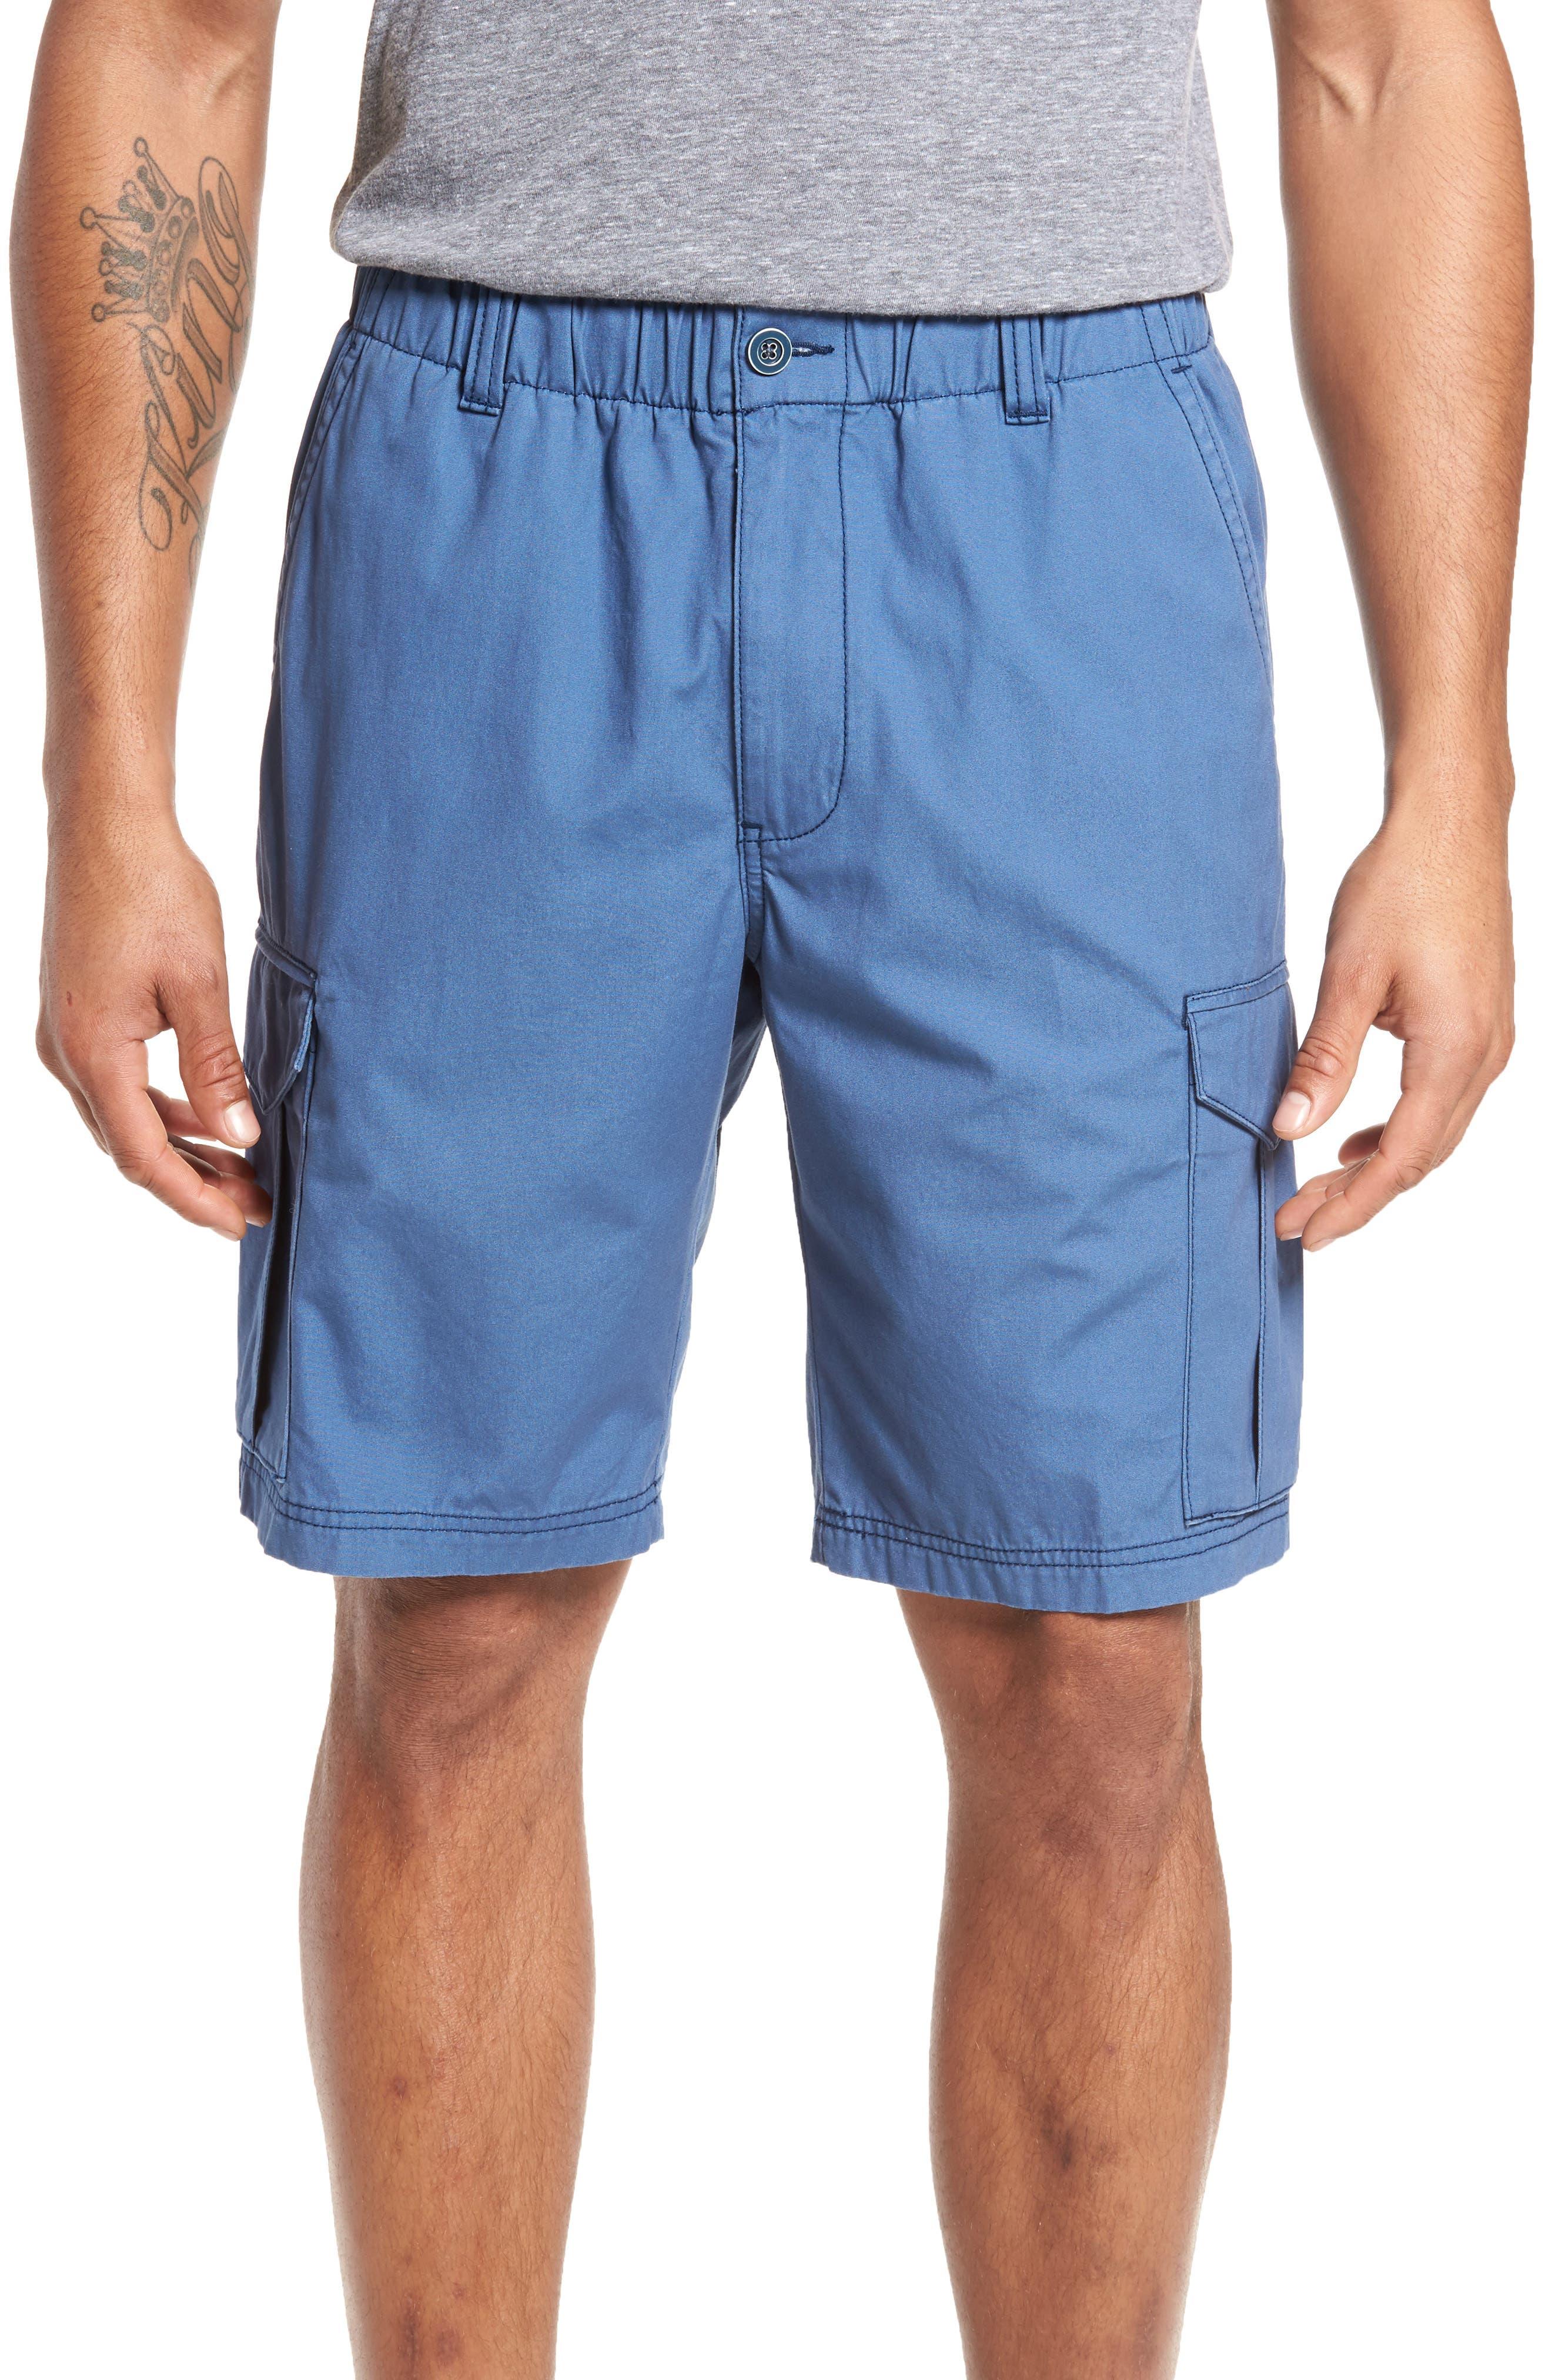 Island Survivalist Cargo Shorts,                             Main thumbnail 1, color,                             Dockside Blue